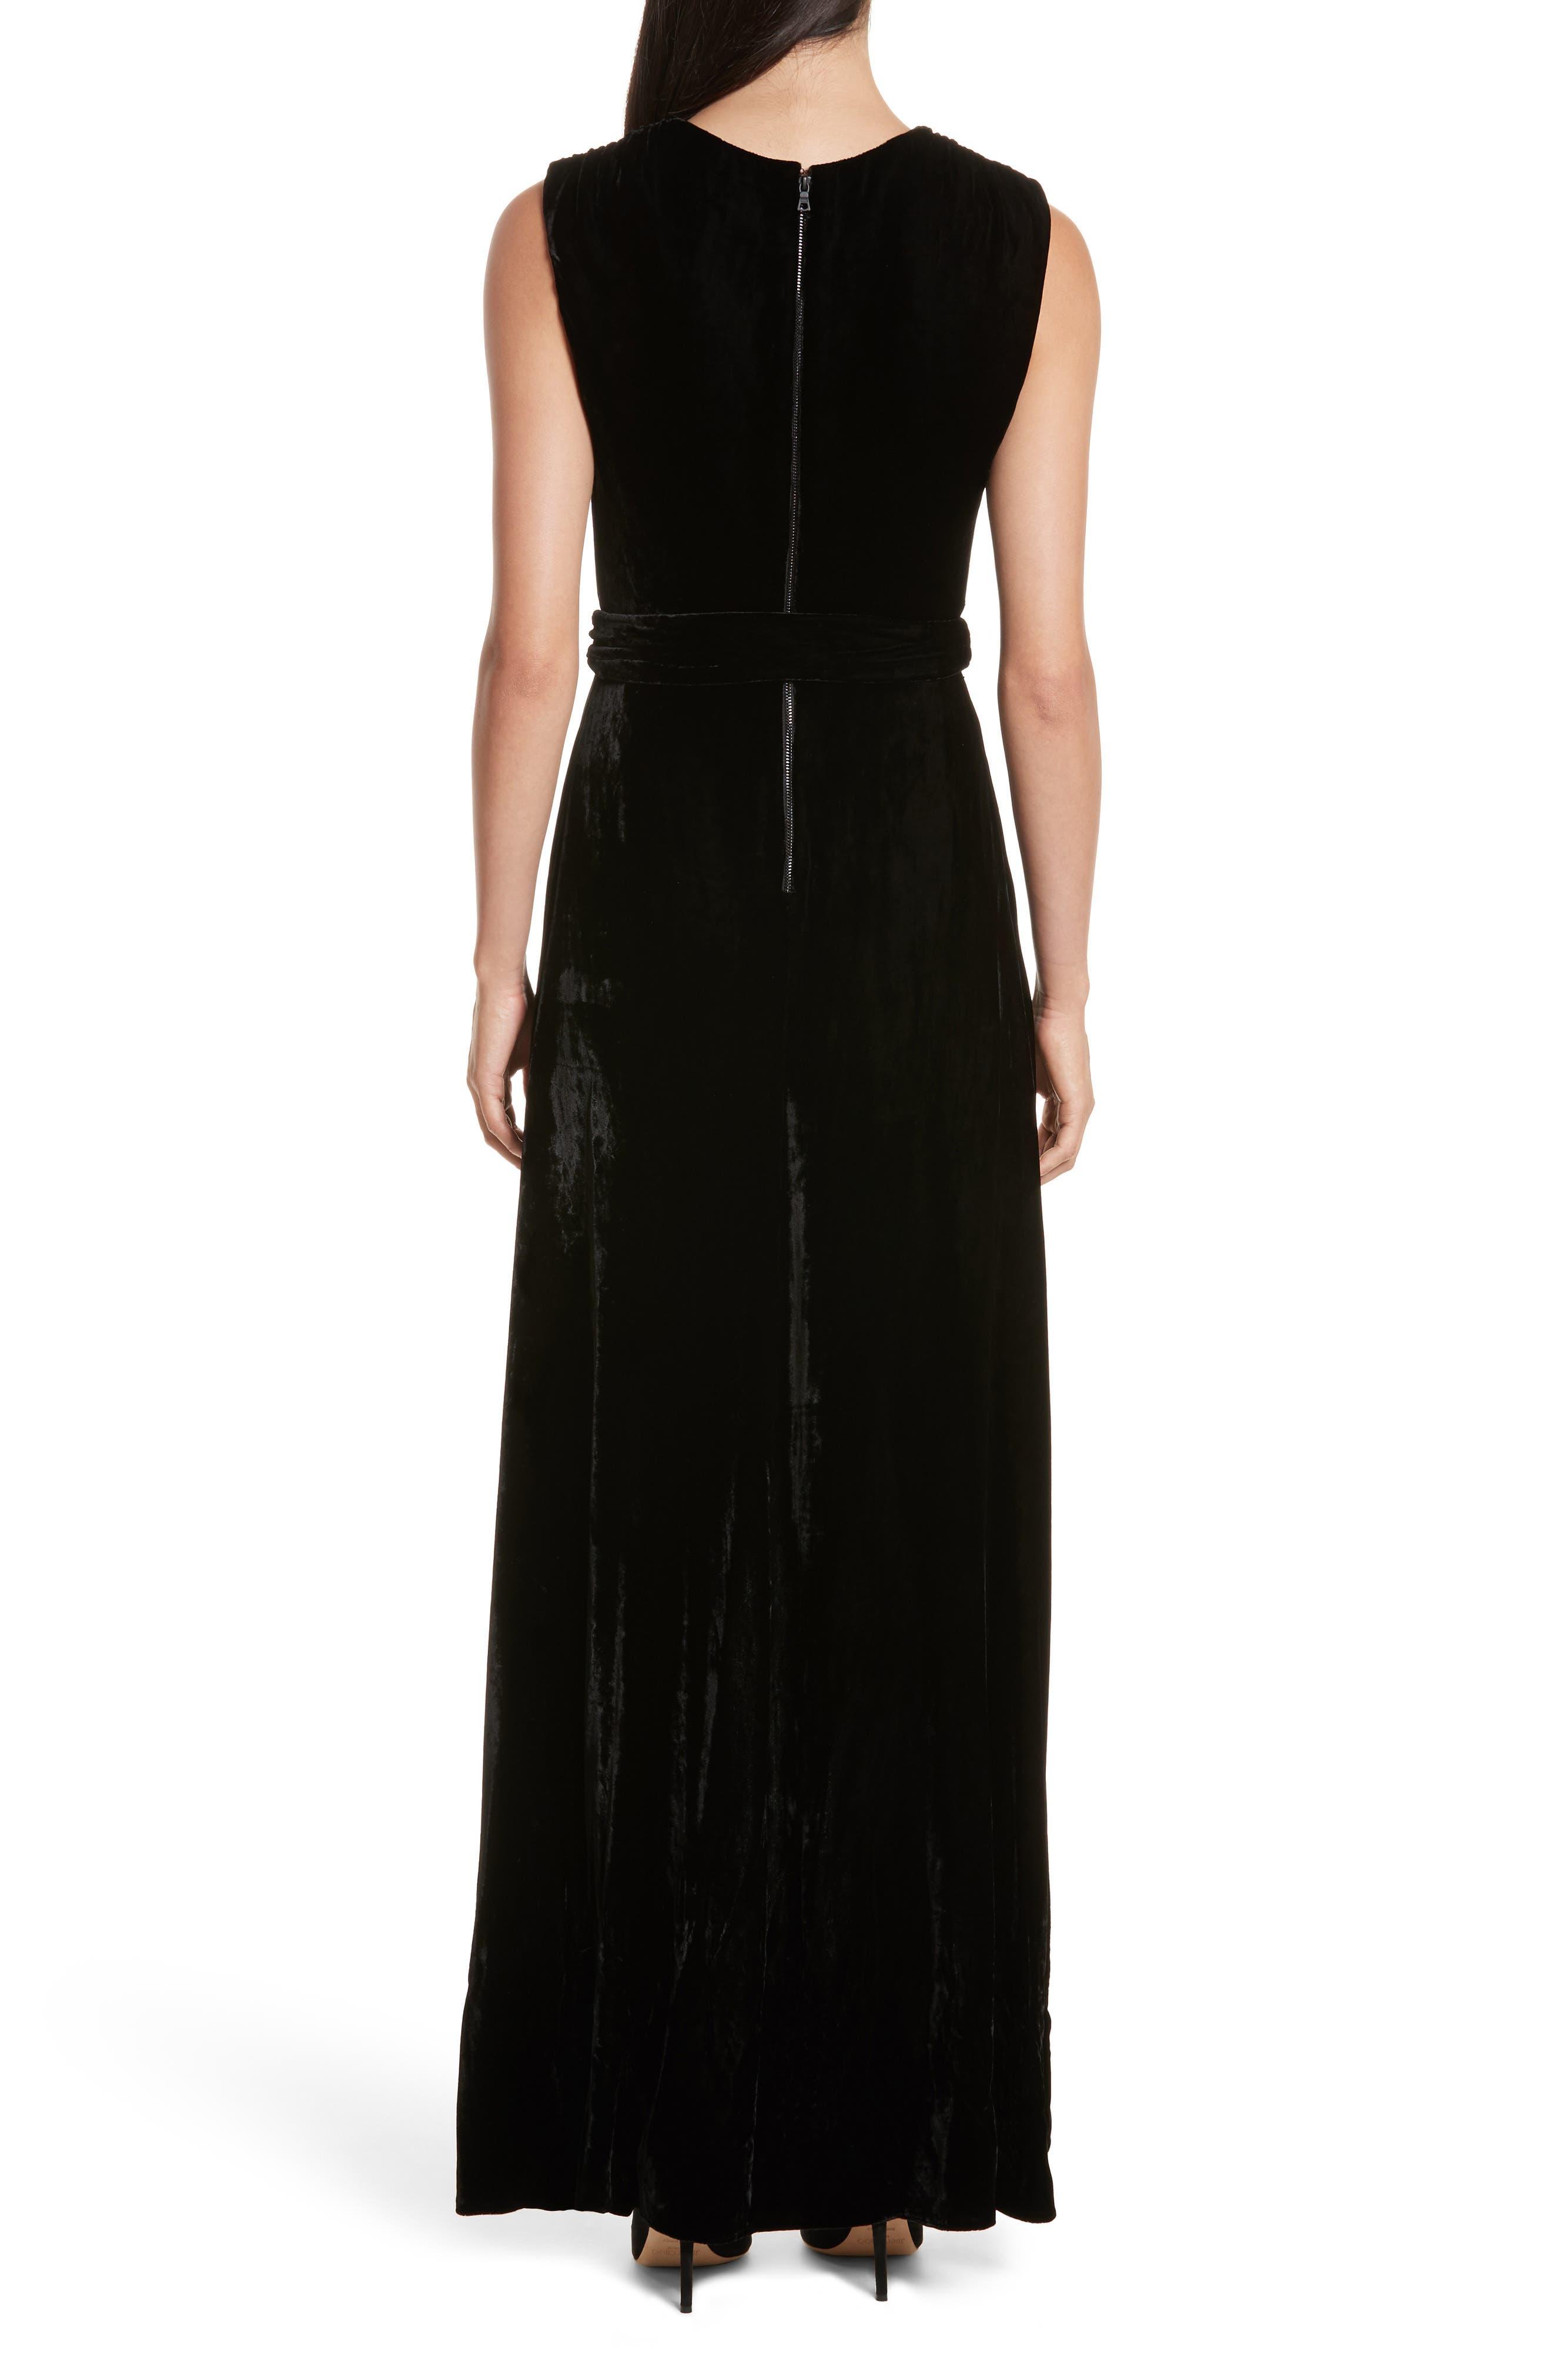 Simmons Velvet Wrap Maxi Dress,                             Alternate thumbnail 2, color,                             Black